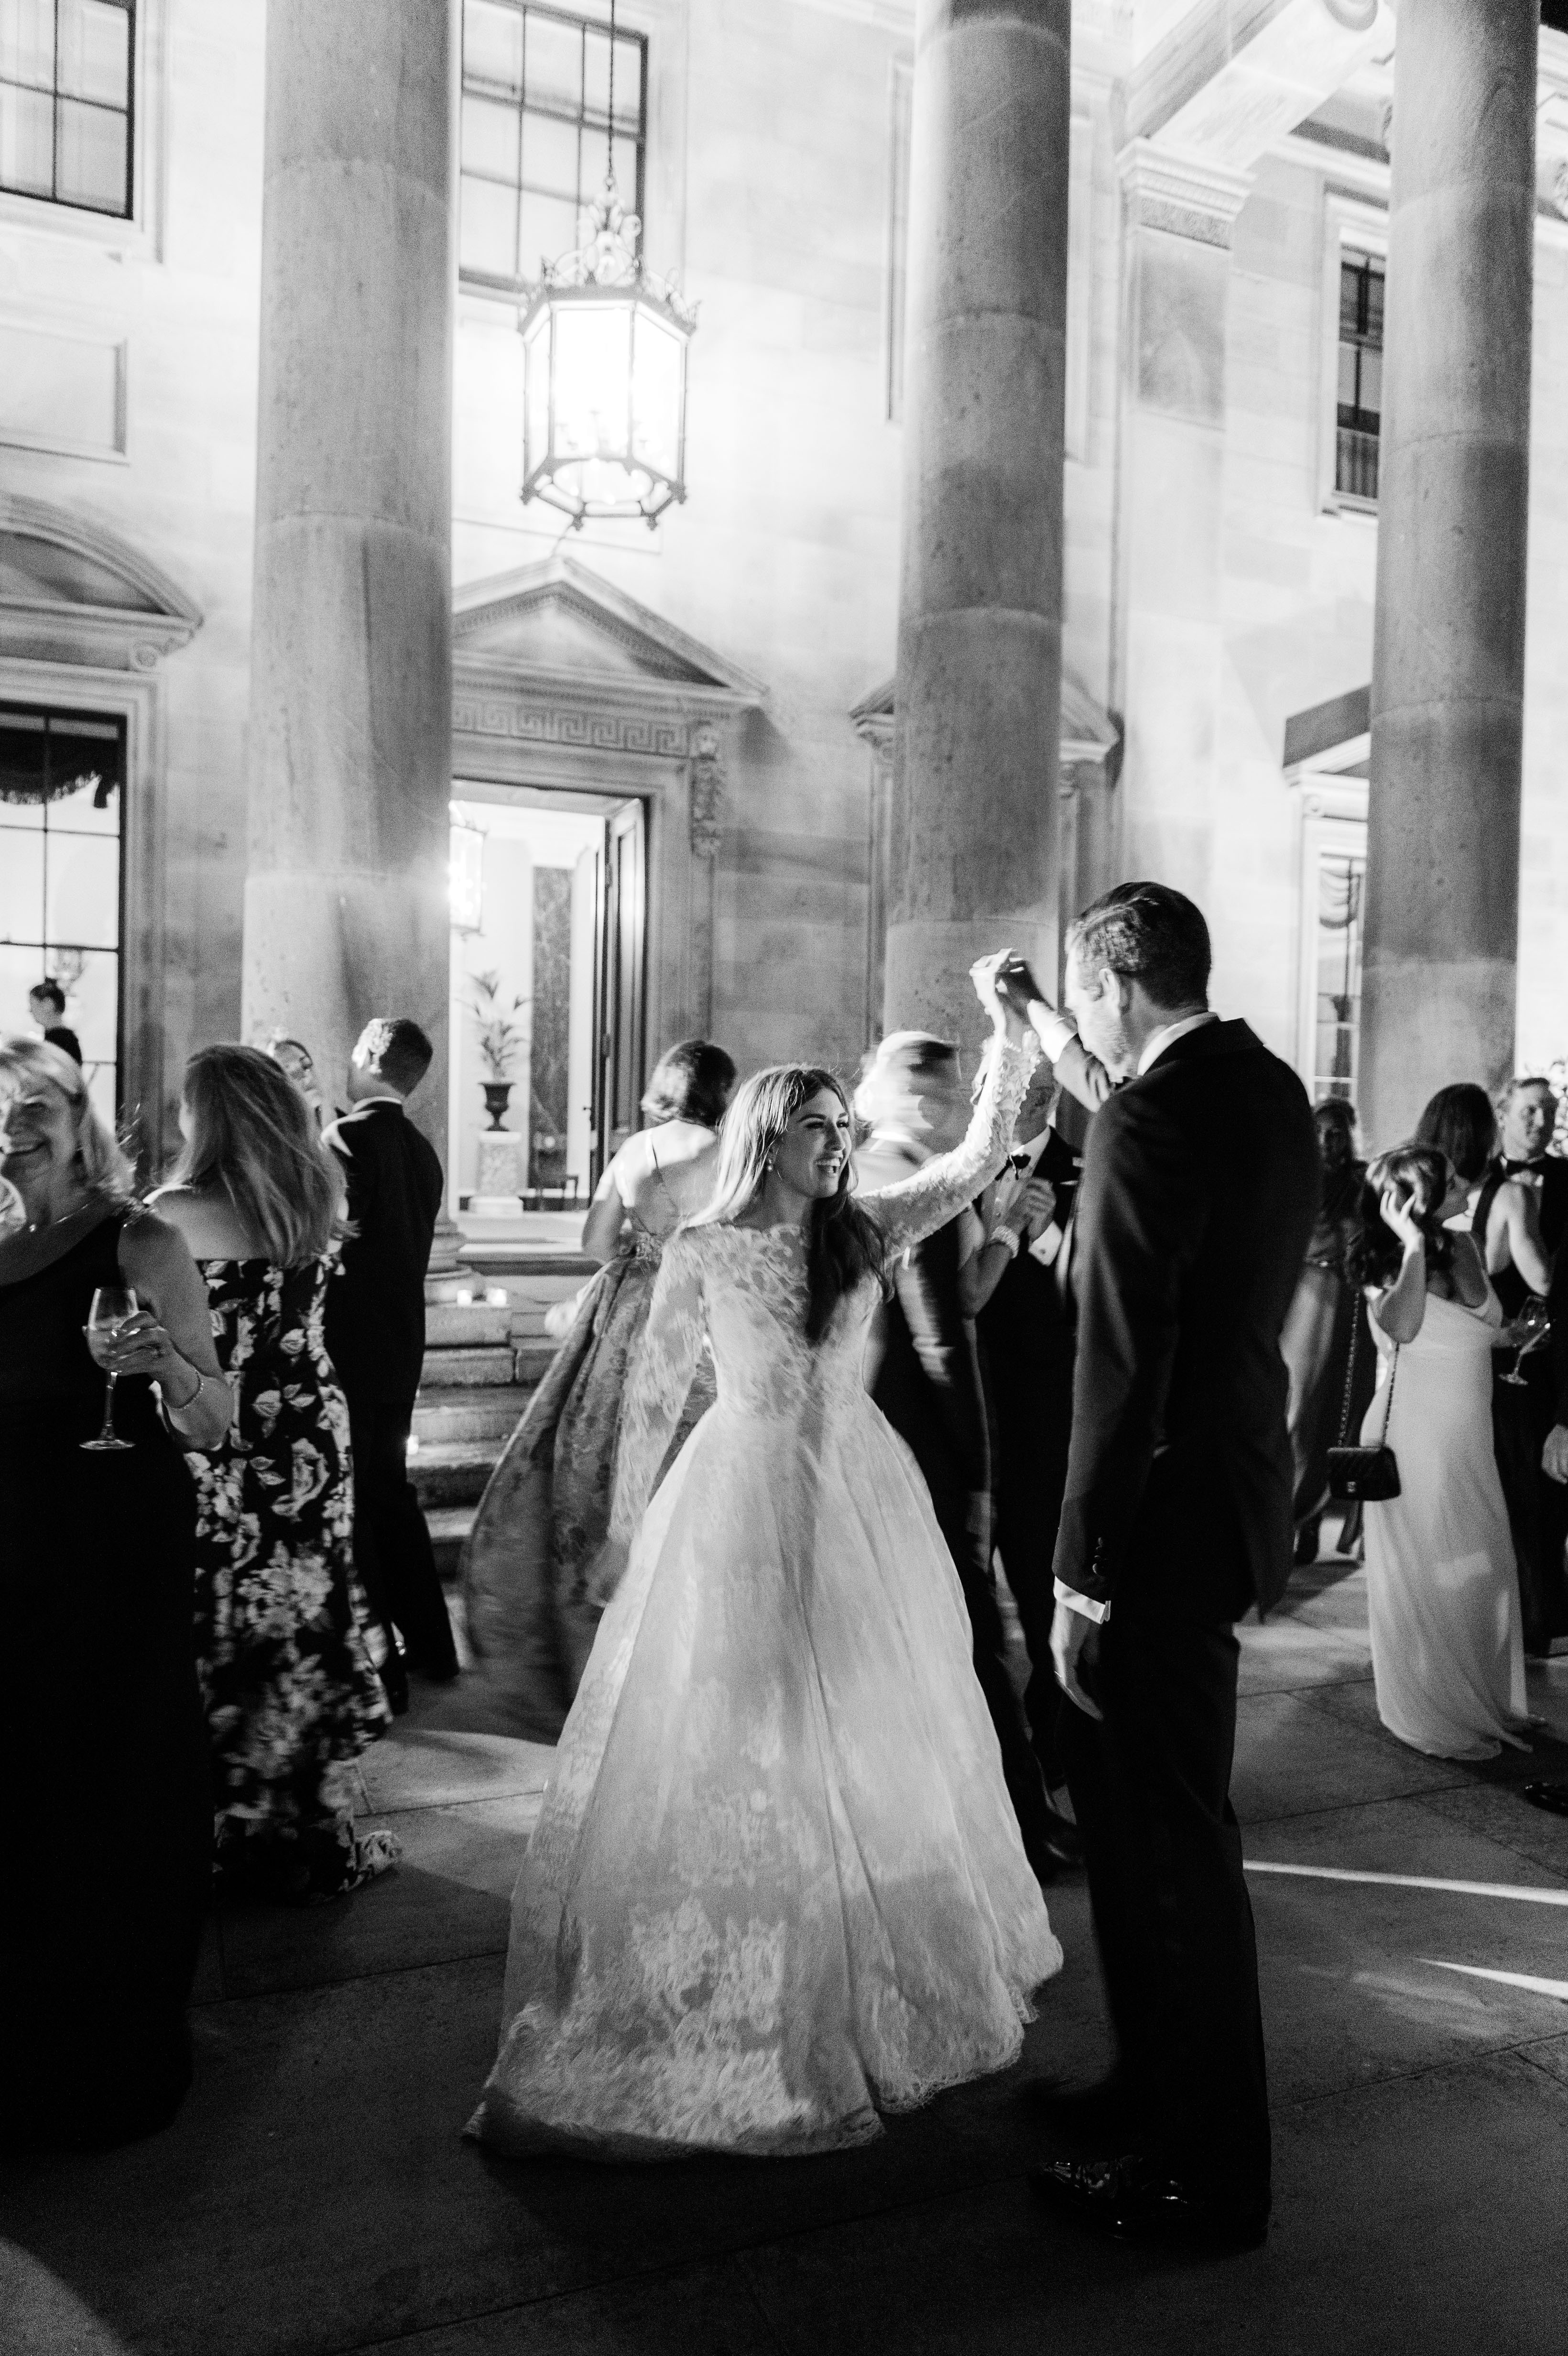 ramsey charles ireland wedding couple dancing black and white